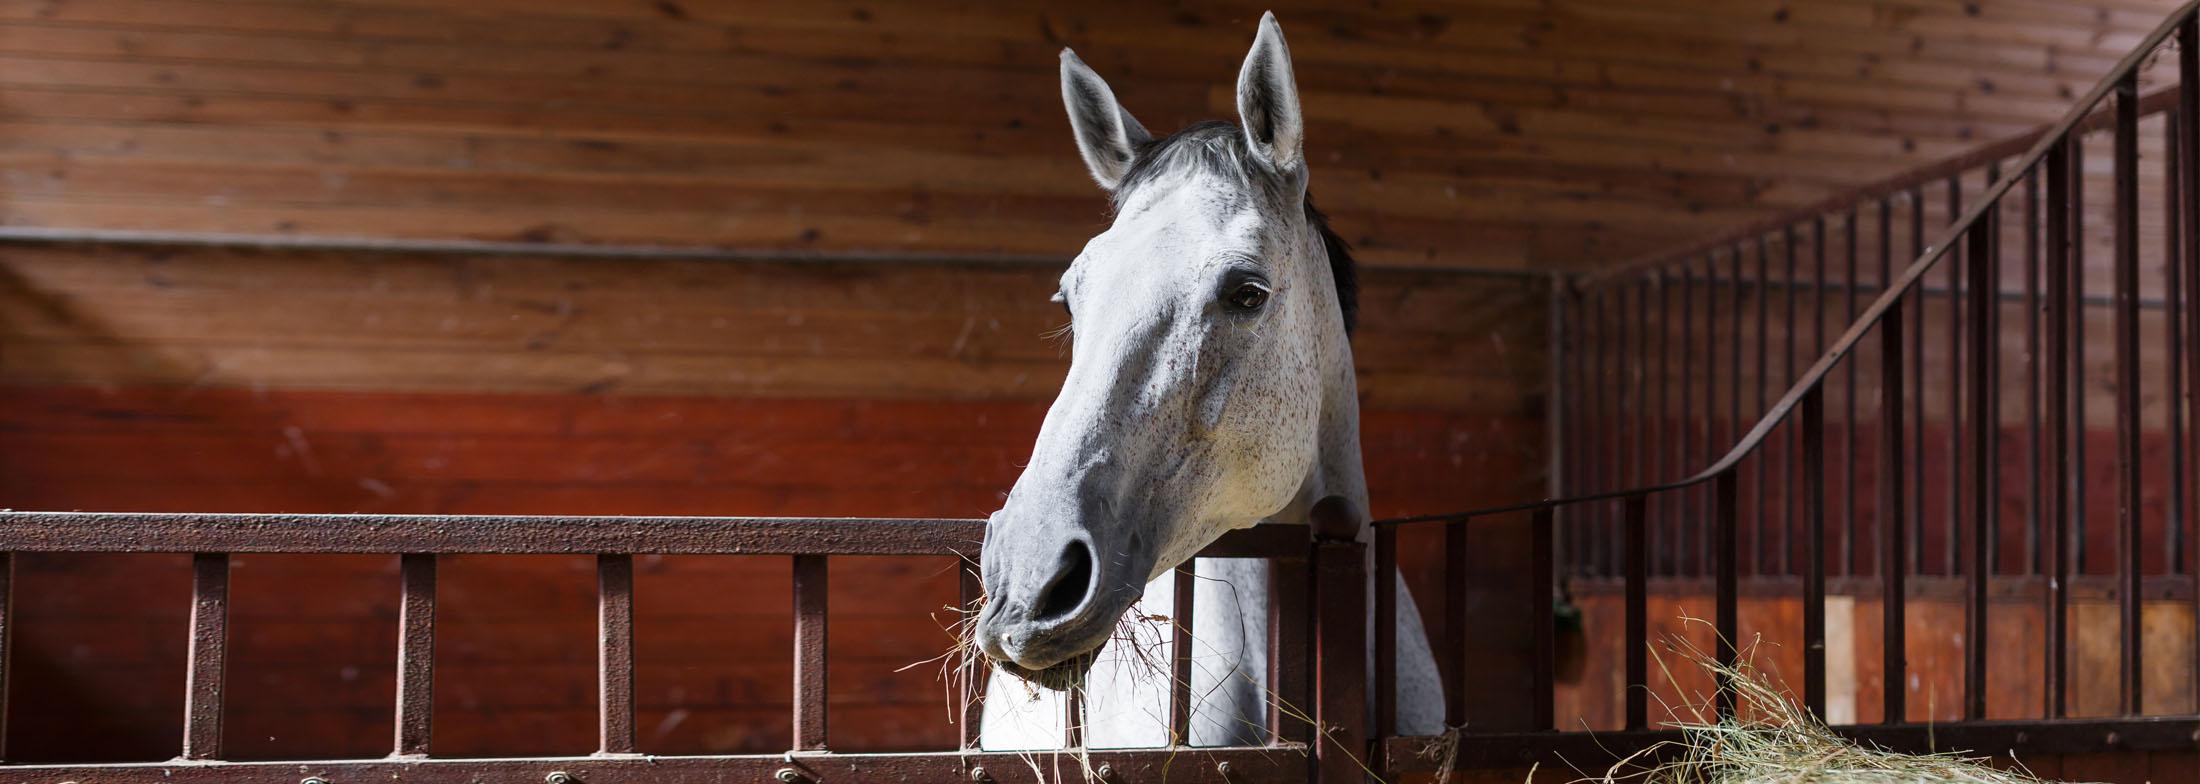 equineslider6